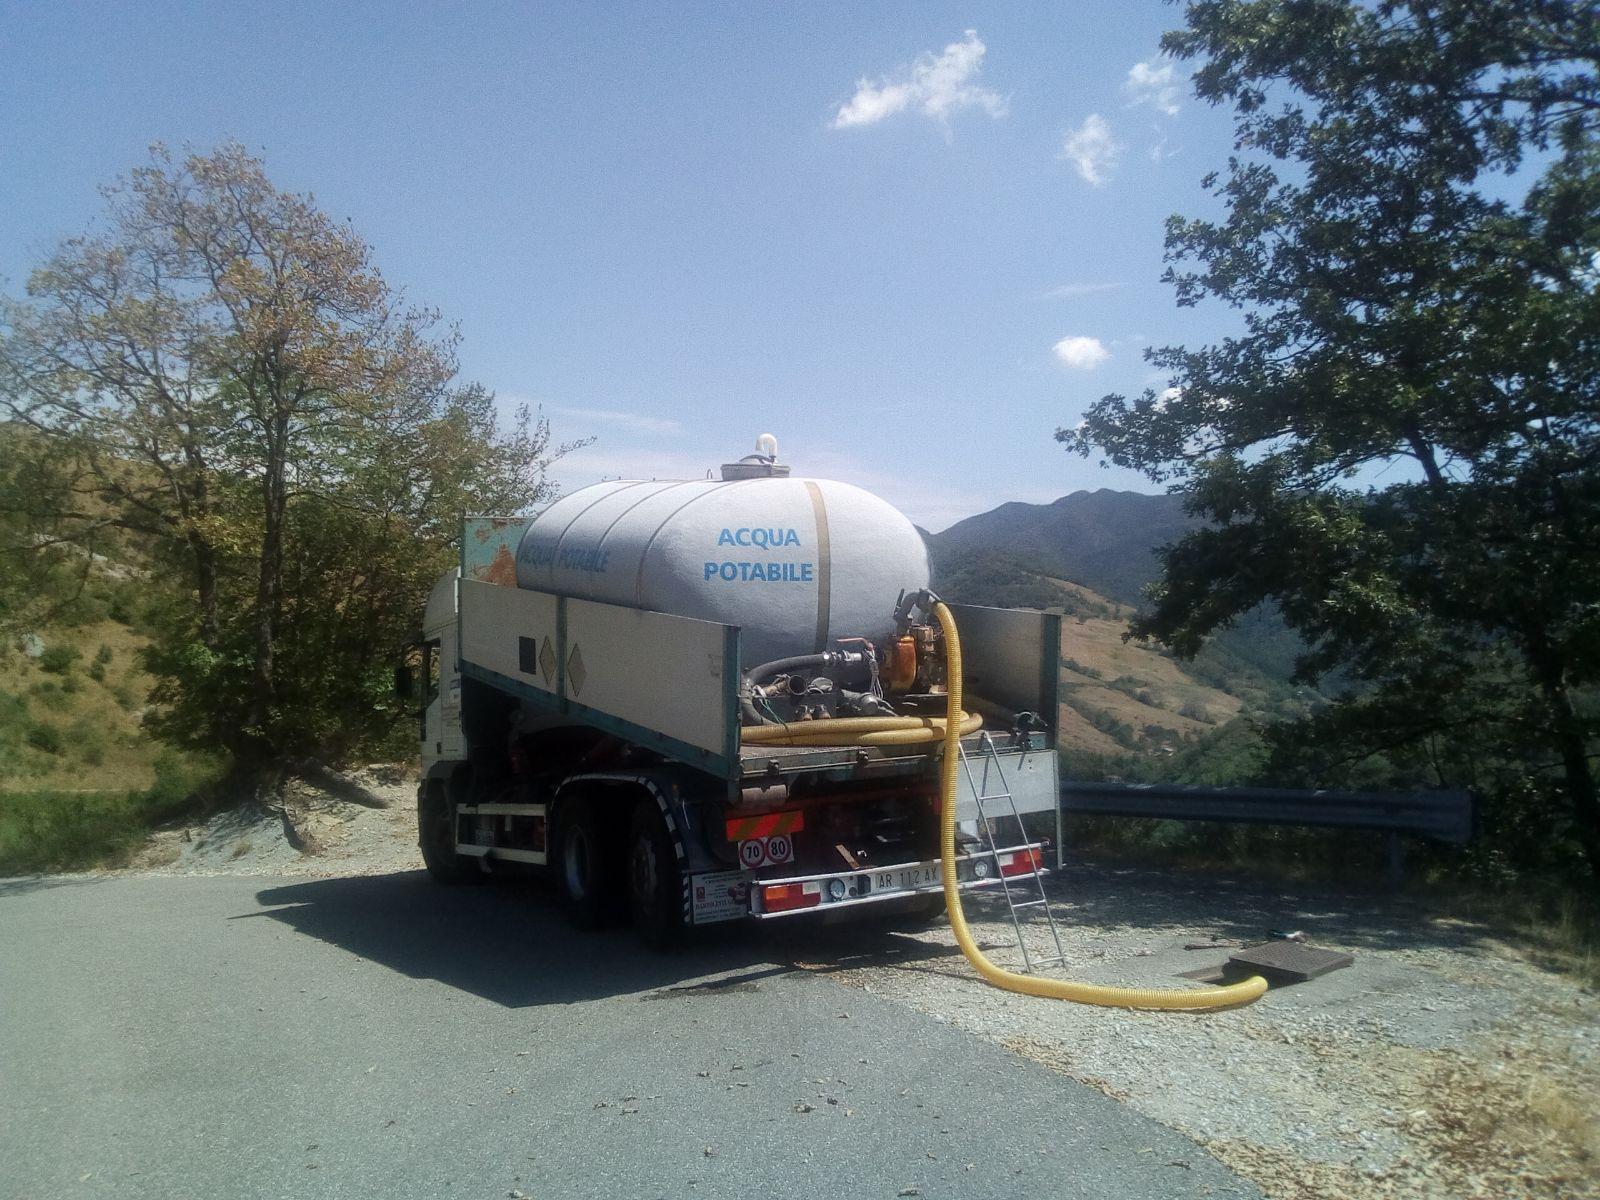 trasporto-acqua-potabile